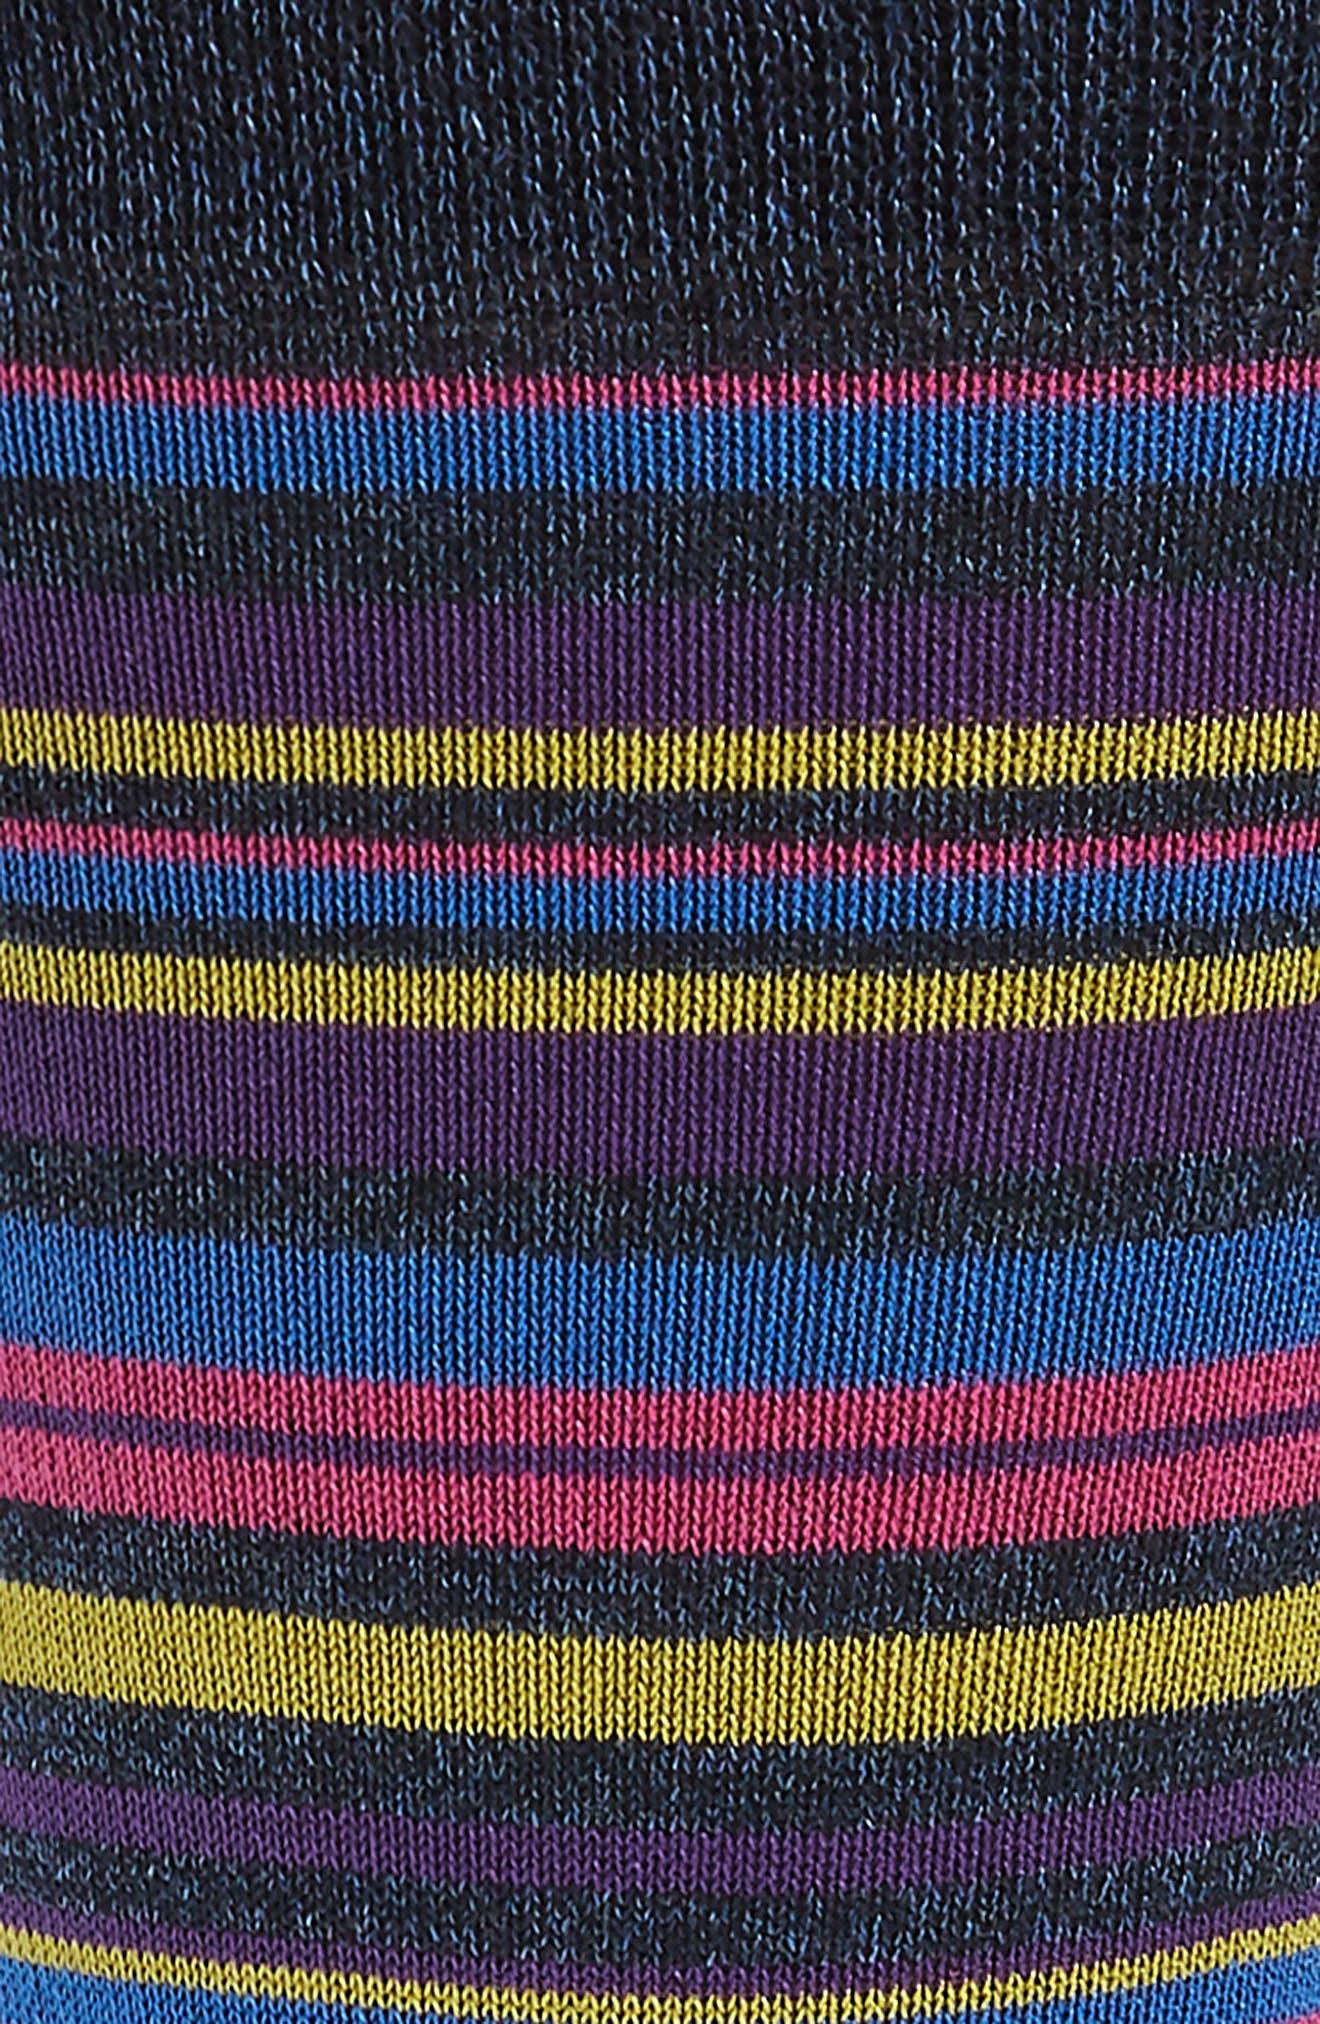 Cotton Blend Socks,                             Alternate thumbnail 2, color,                             408